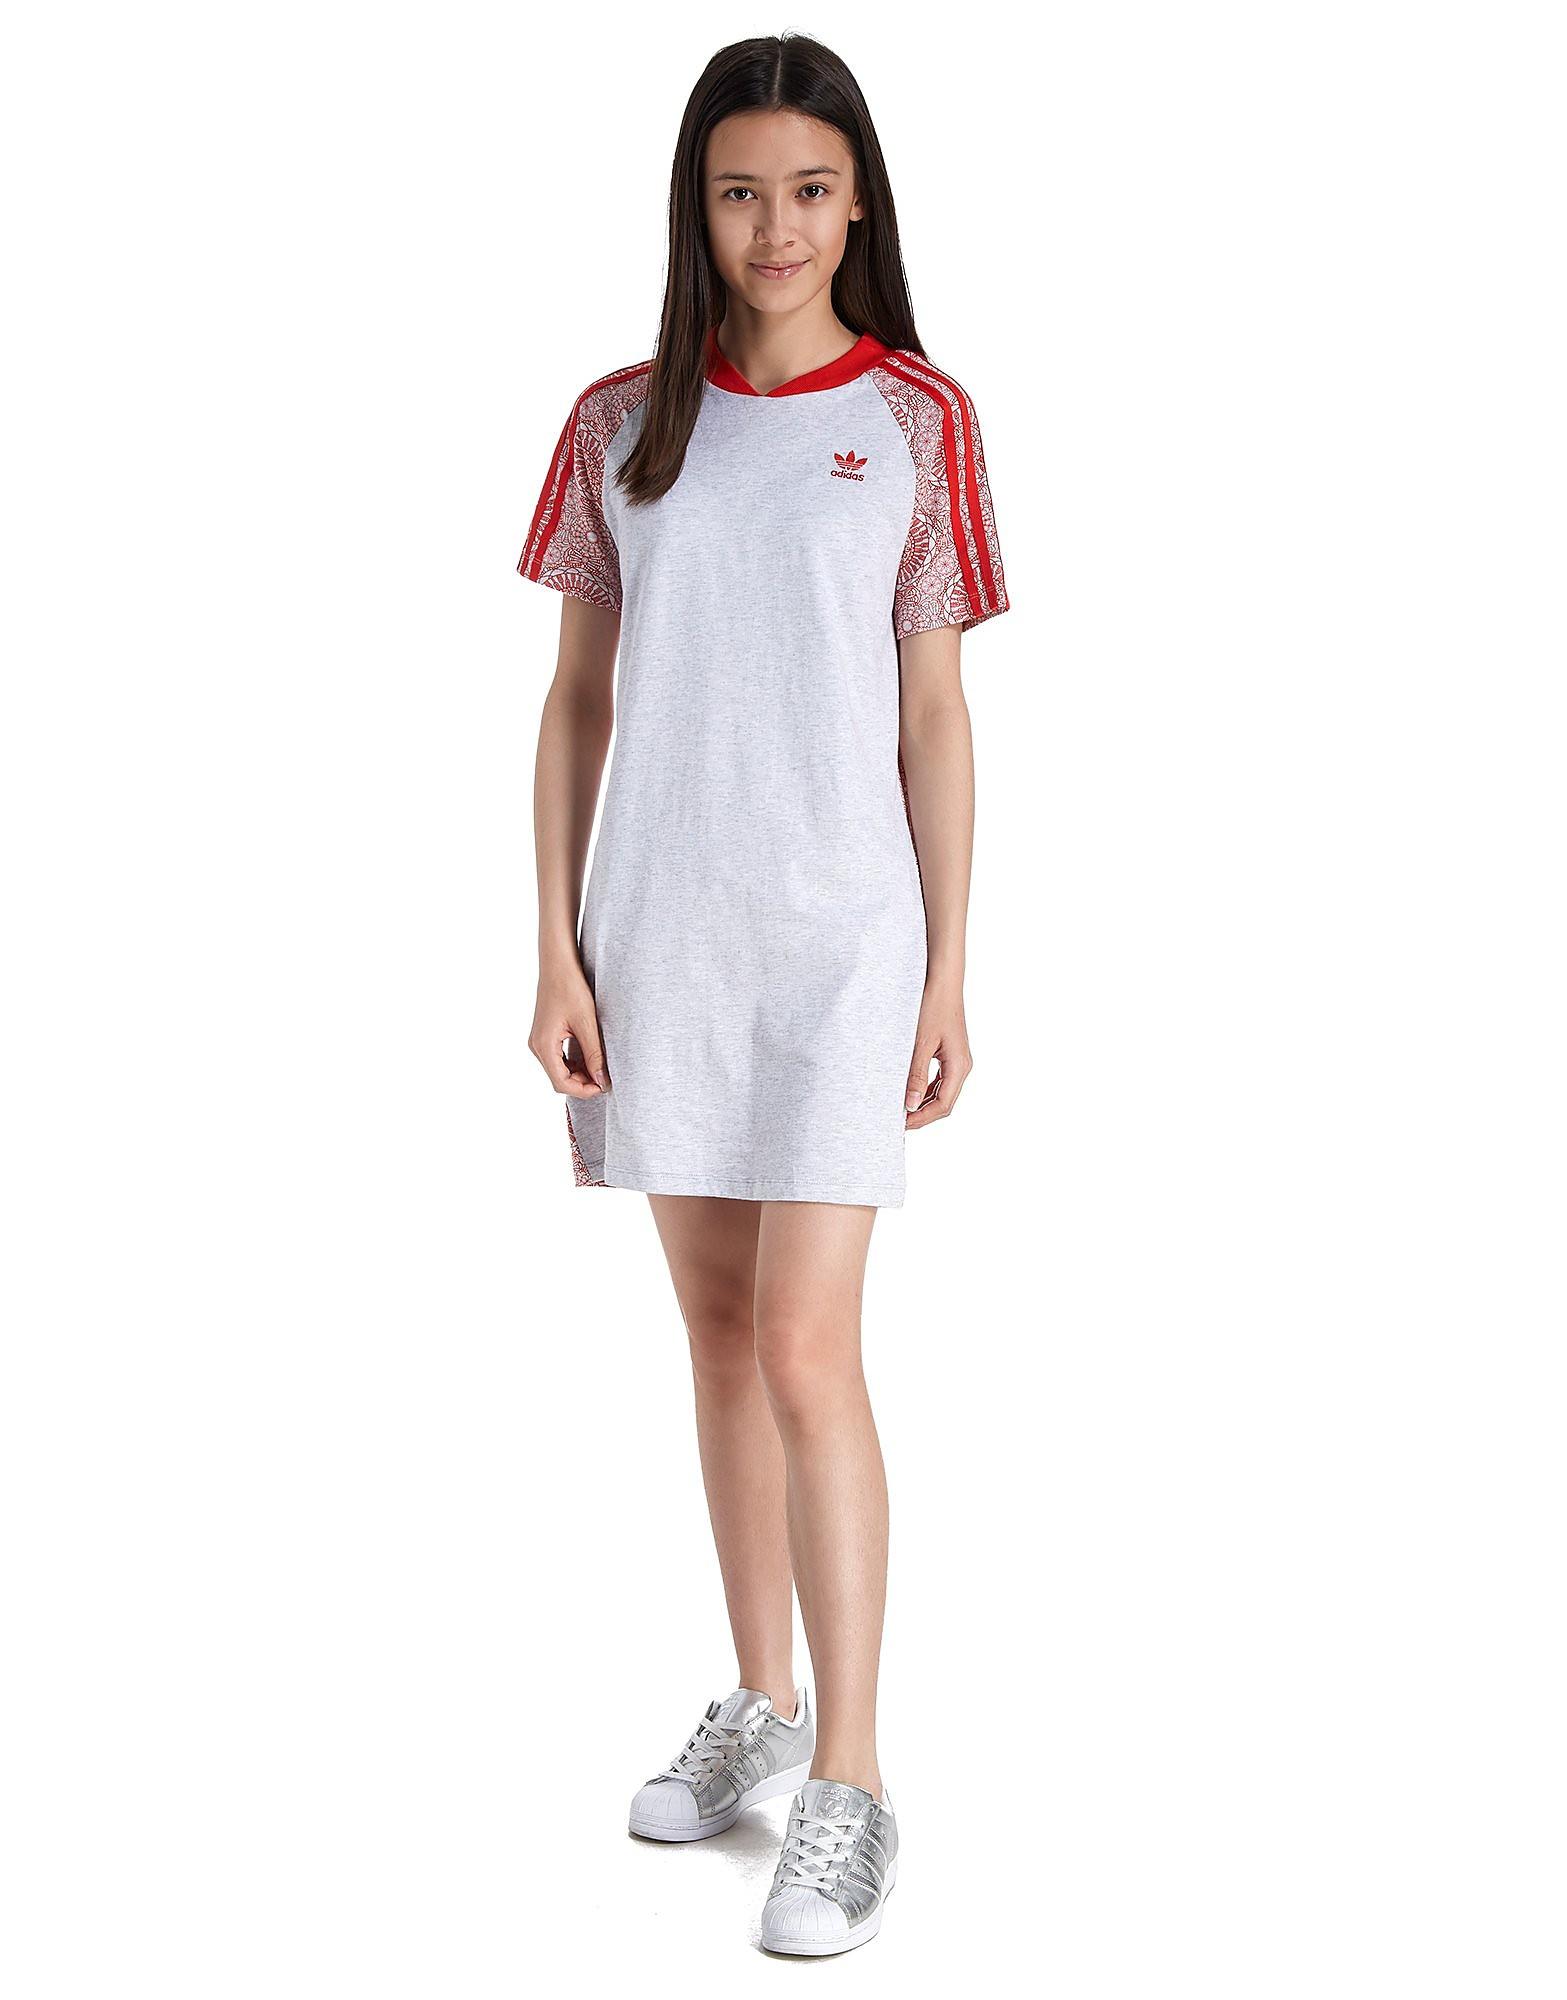 adidas Originals T-shirt Girls' London Junior